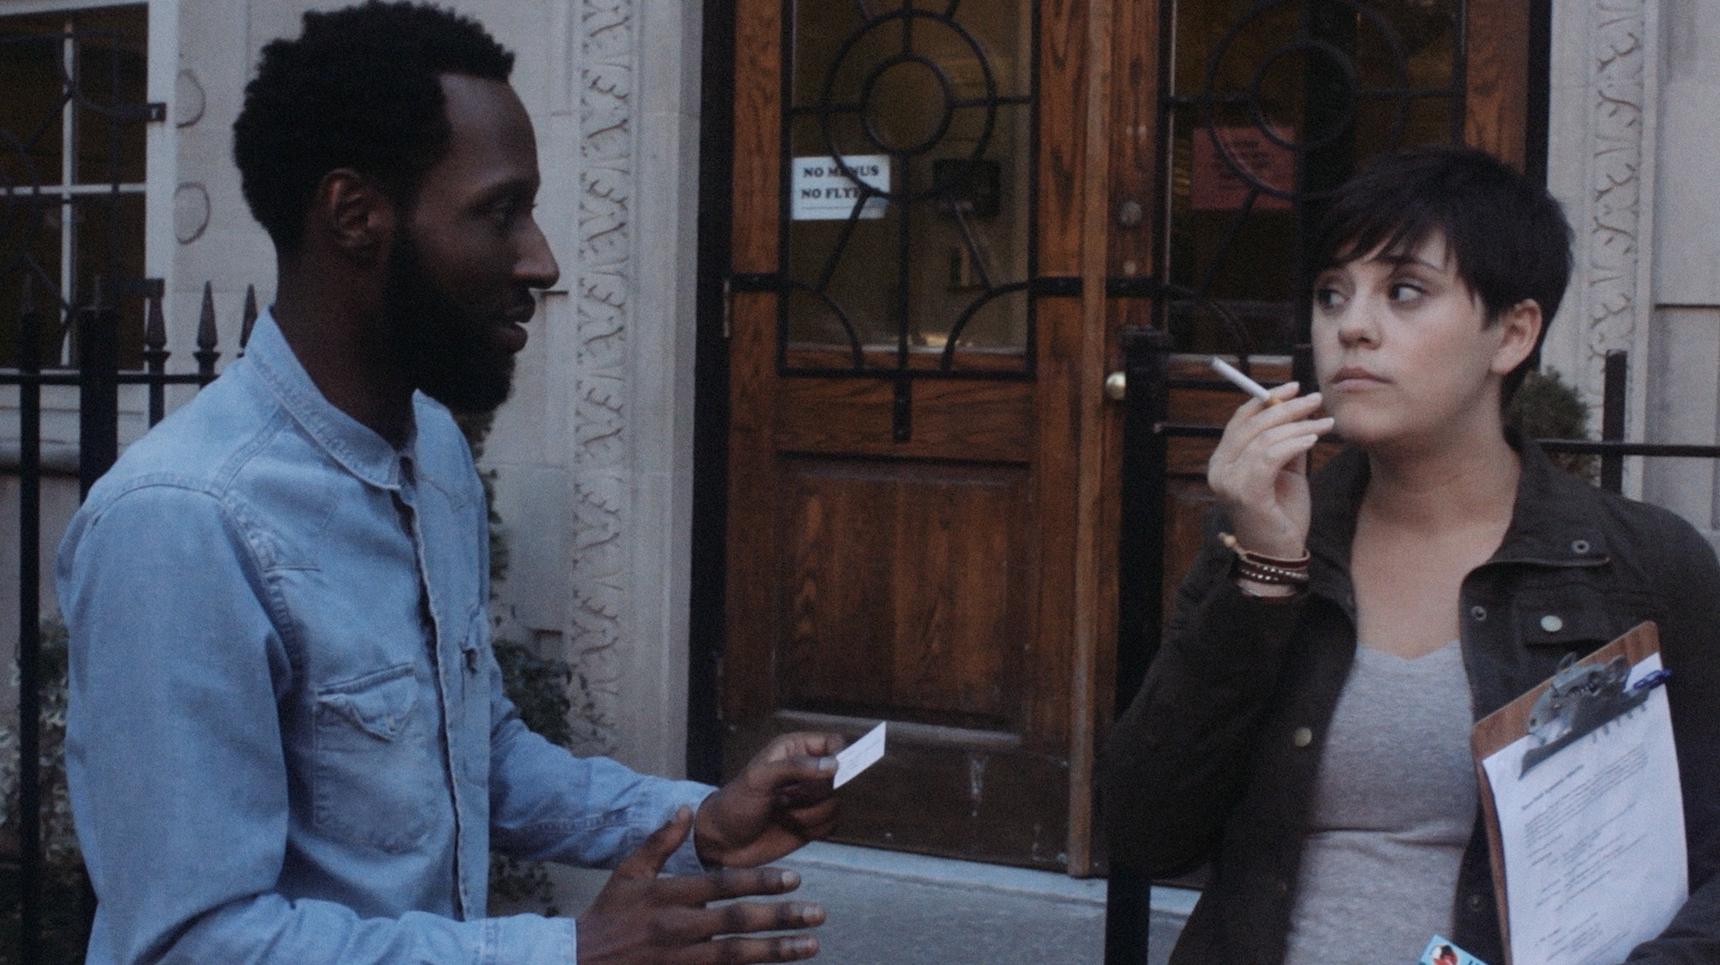 Jersey City Filmmaker's Premiere: Ambition